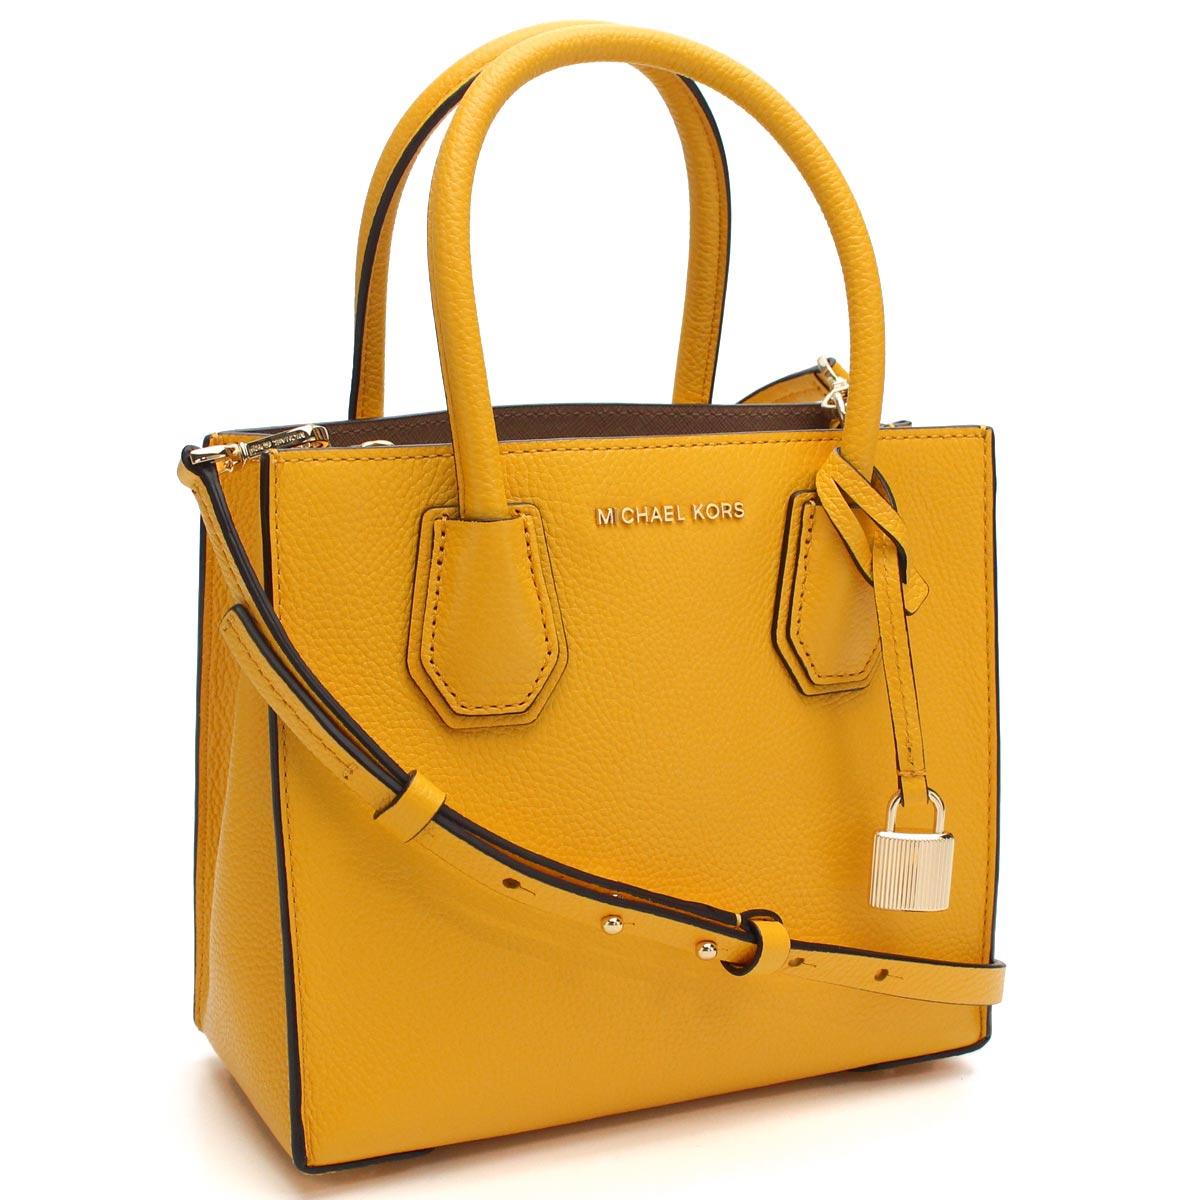 a0c02b4bfe67 Bighit The total brand wholesale: Michael Kors (MICHAEL KORS) MERCER Mercer  handbag 30F6GM9M2L SUNFLOWER yellow | Rakuten Global Market